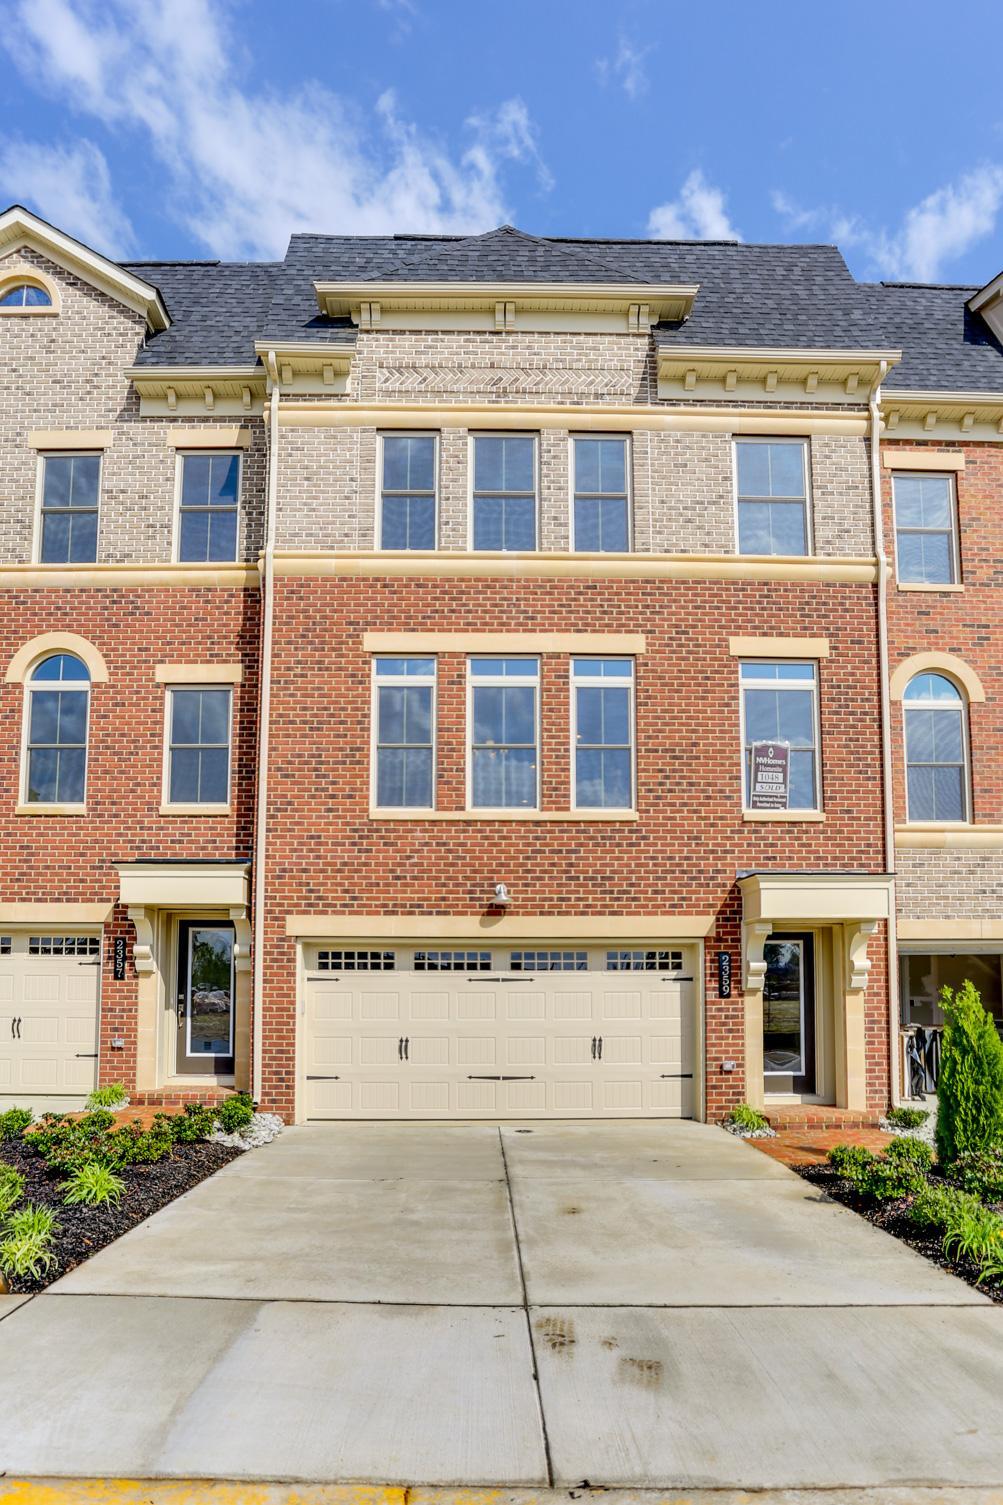 Townhouse for Rent at 2359 Chadlington Rd 2359 Chadlington Rd Falls Church, Virginia 22043 United States